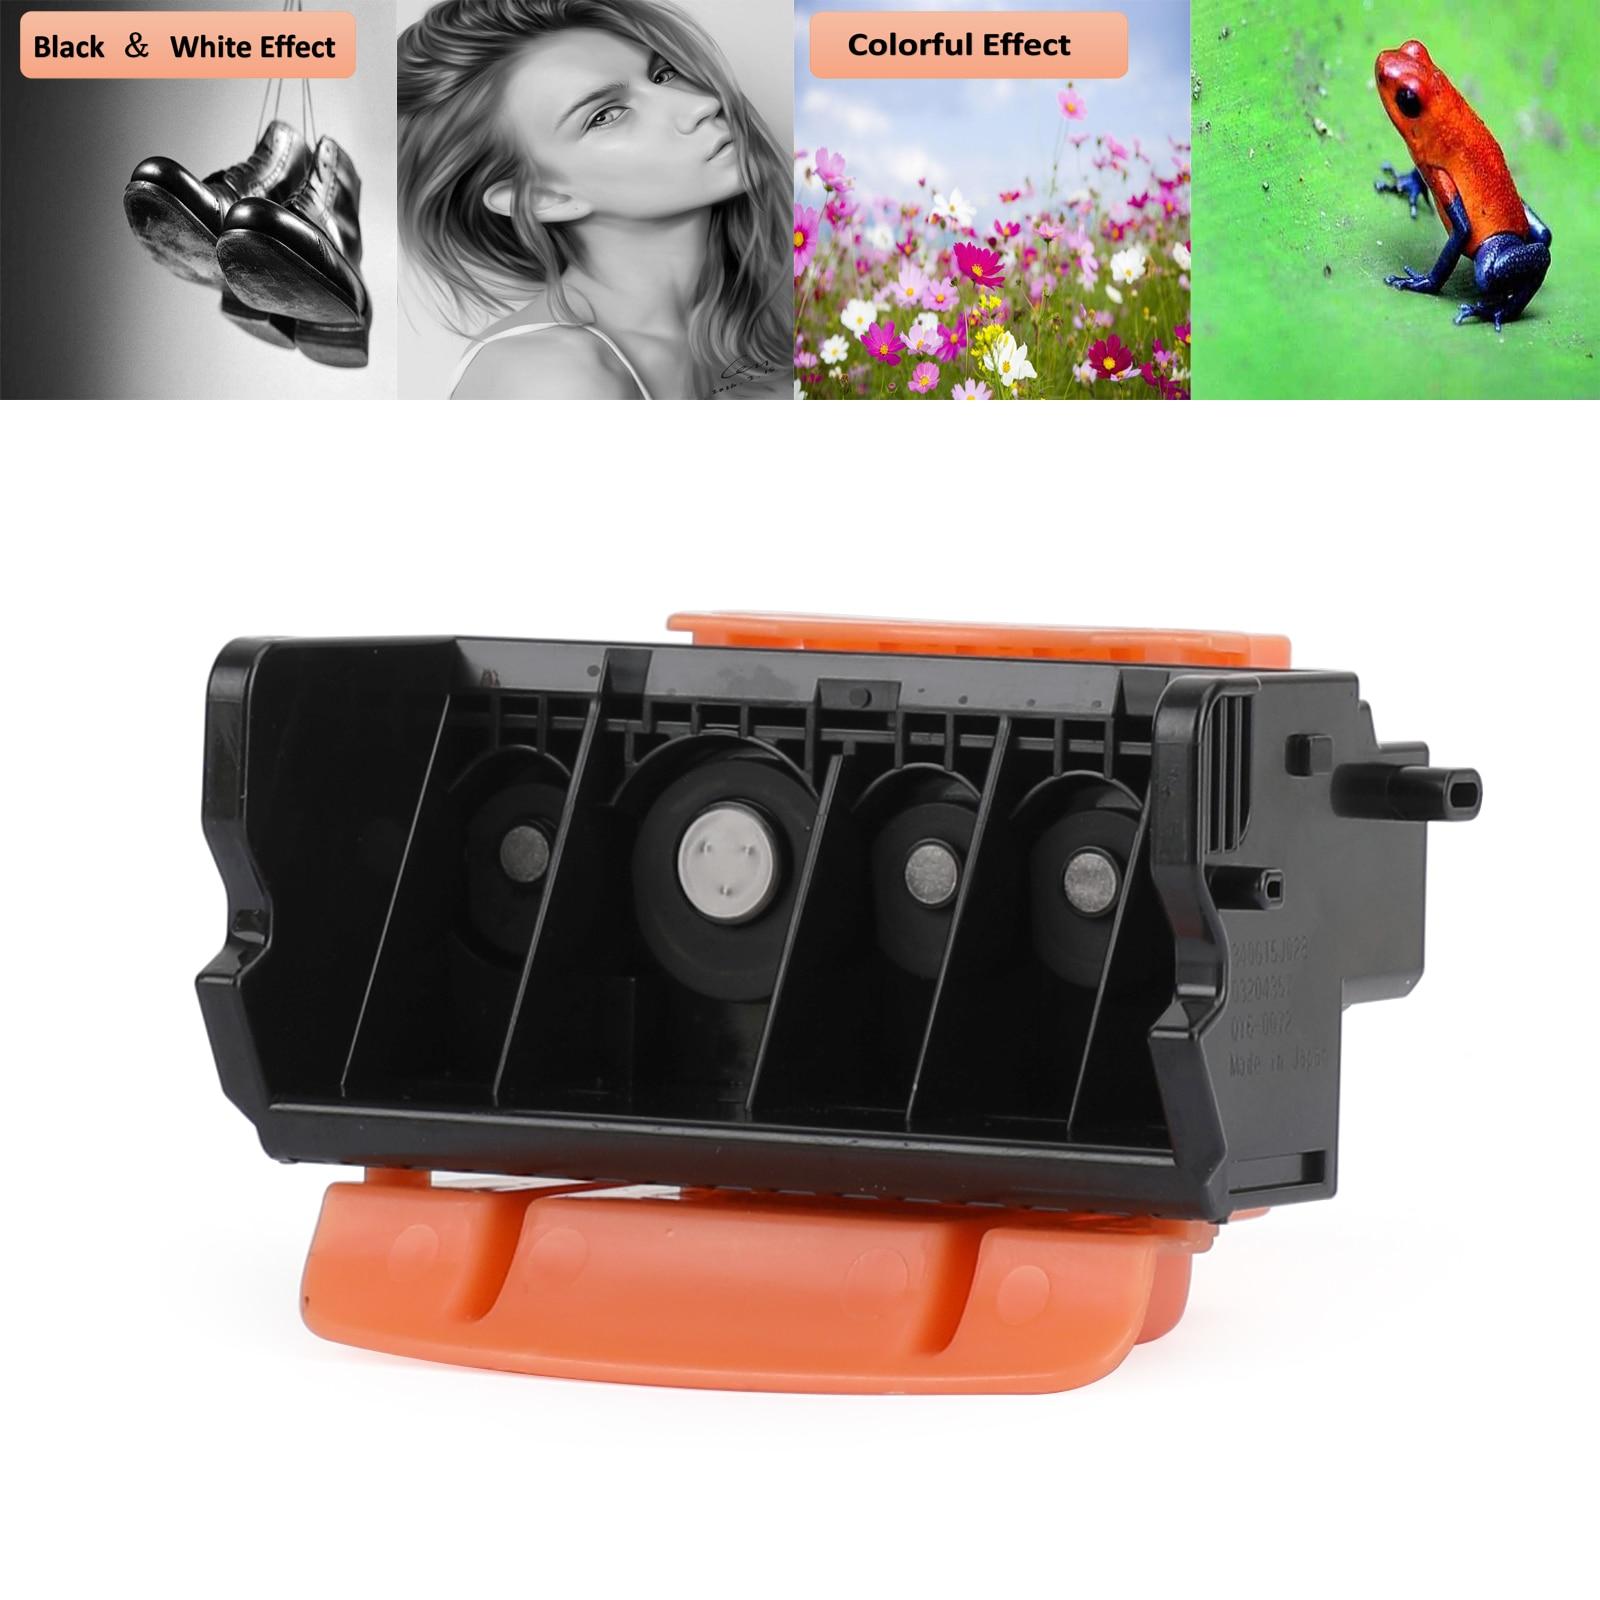 Artudatech كامل اللون QY6-0072 رأس الطباعة الطابعة رئيس ل iP4600 iP4680 iP4700 iP4760 MP630